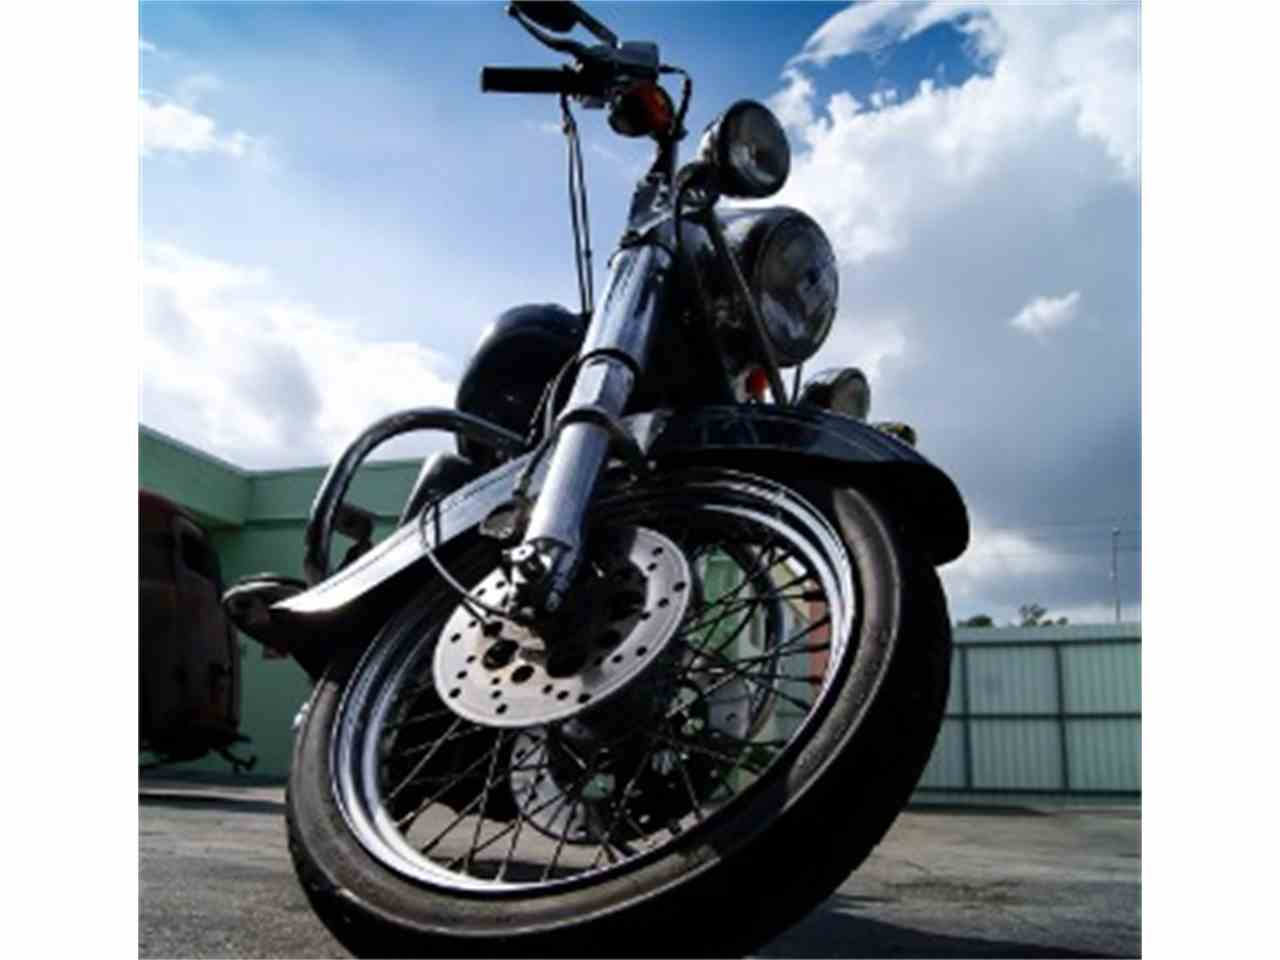 Large Picture of '82 HARLEY DAVIDSON Harley Davidson located in Florida - FVQR